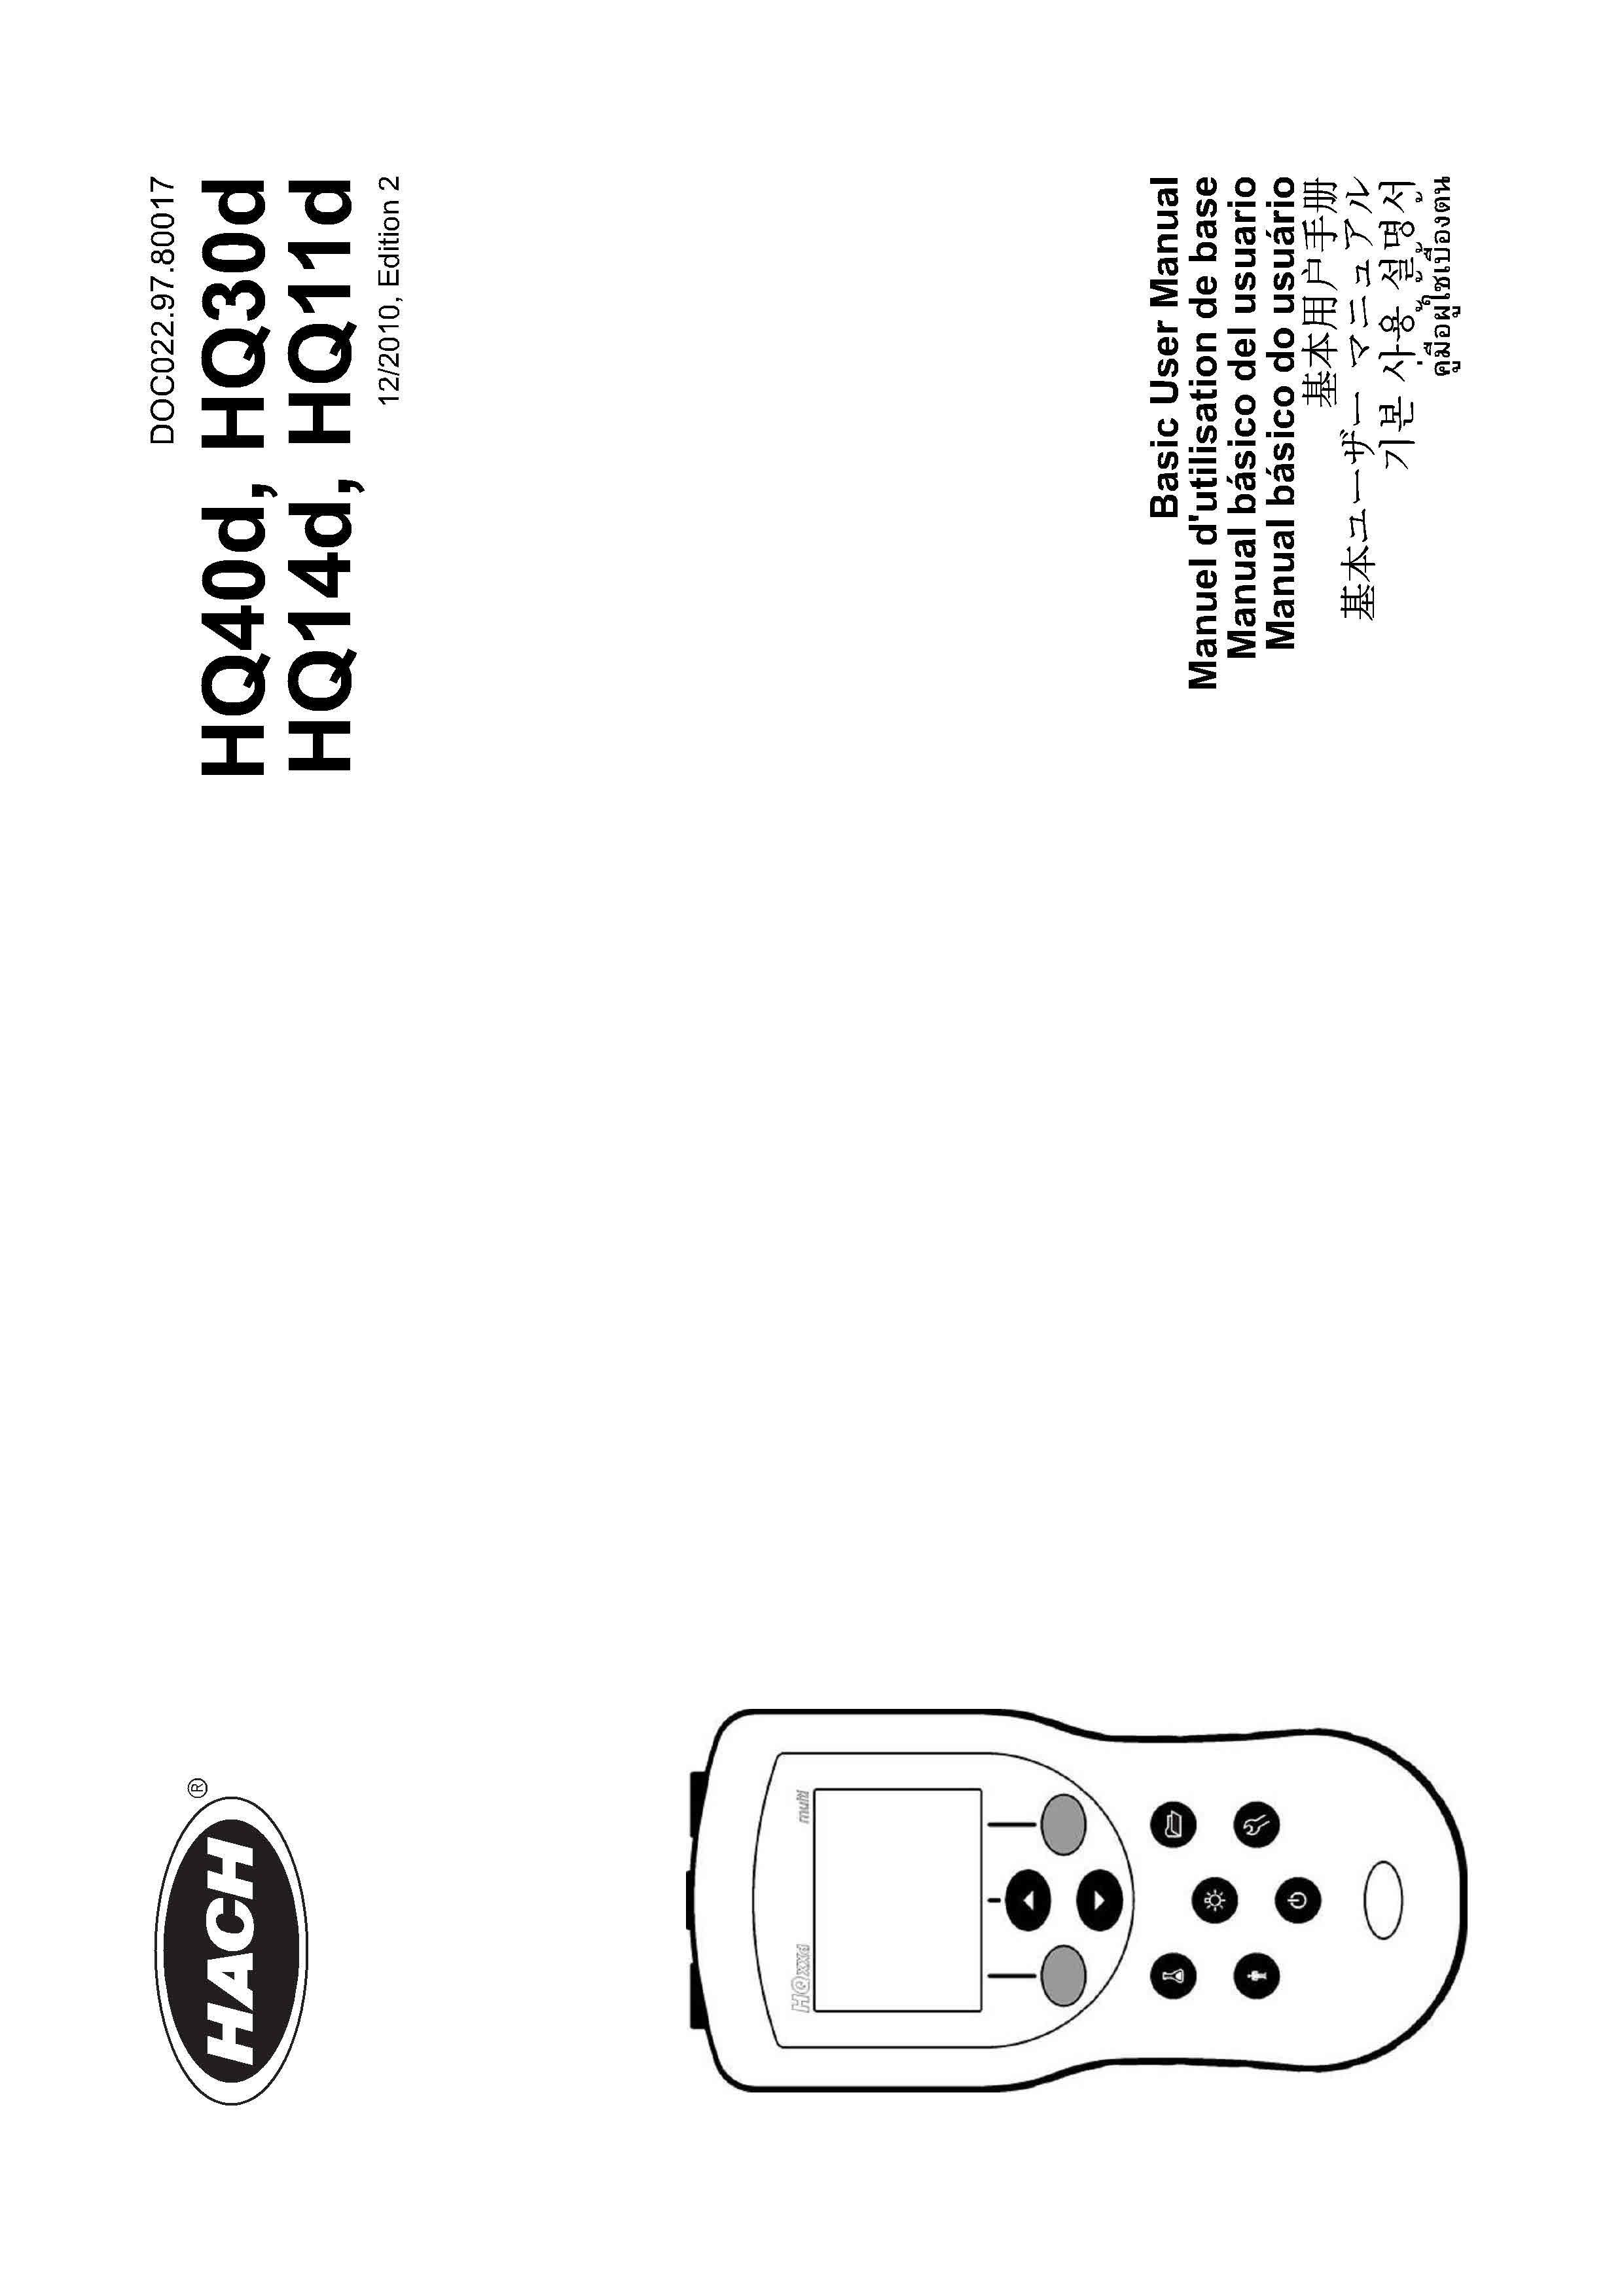 HACH哈希 HQ40d HQ30d HQ14d HQ11d用户手册